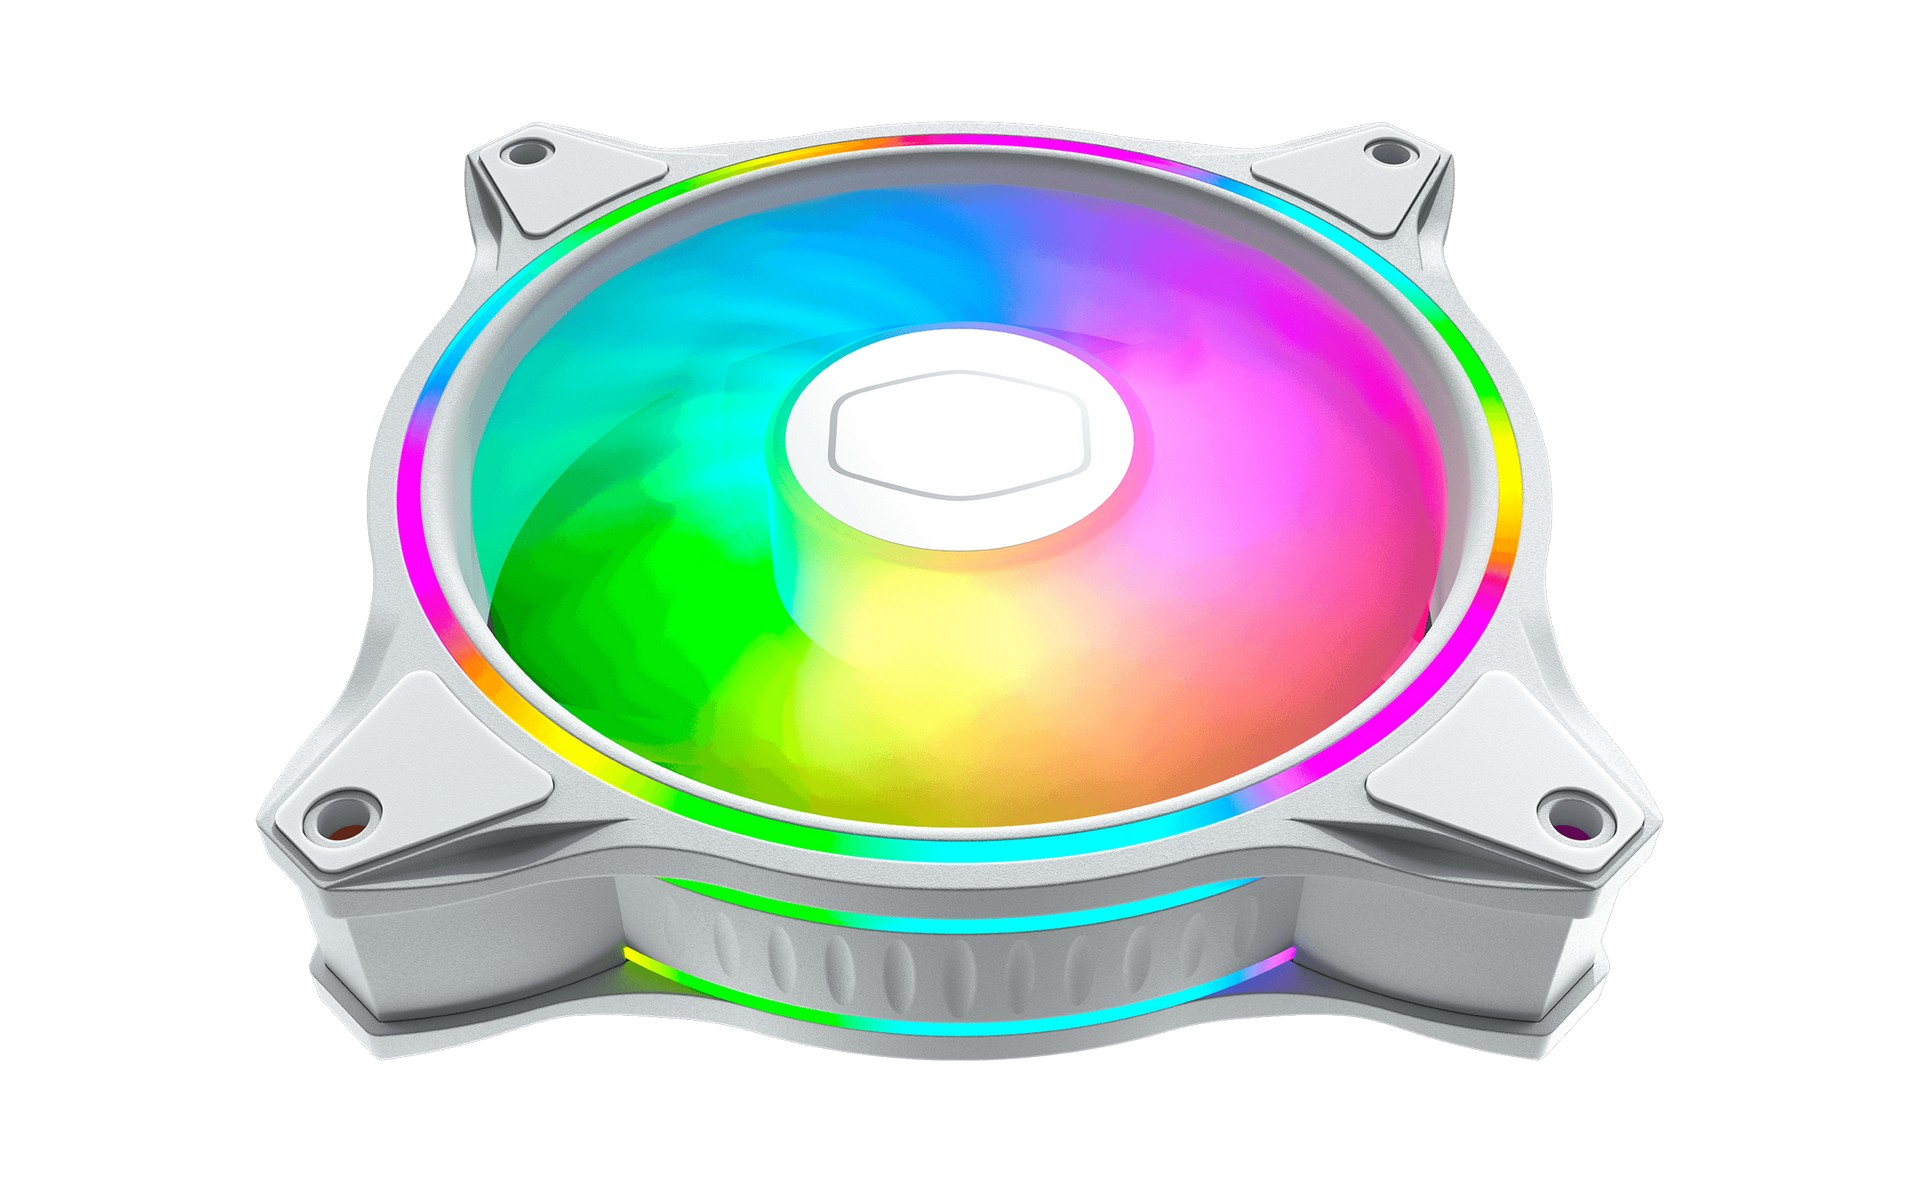 Đèn led ARGB vòng lặp kép